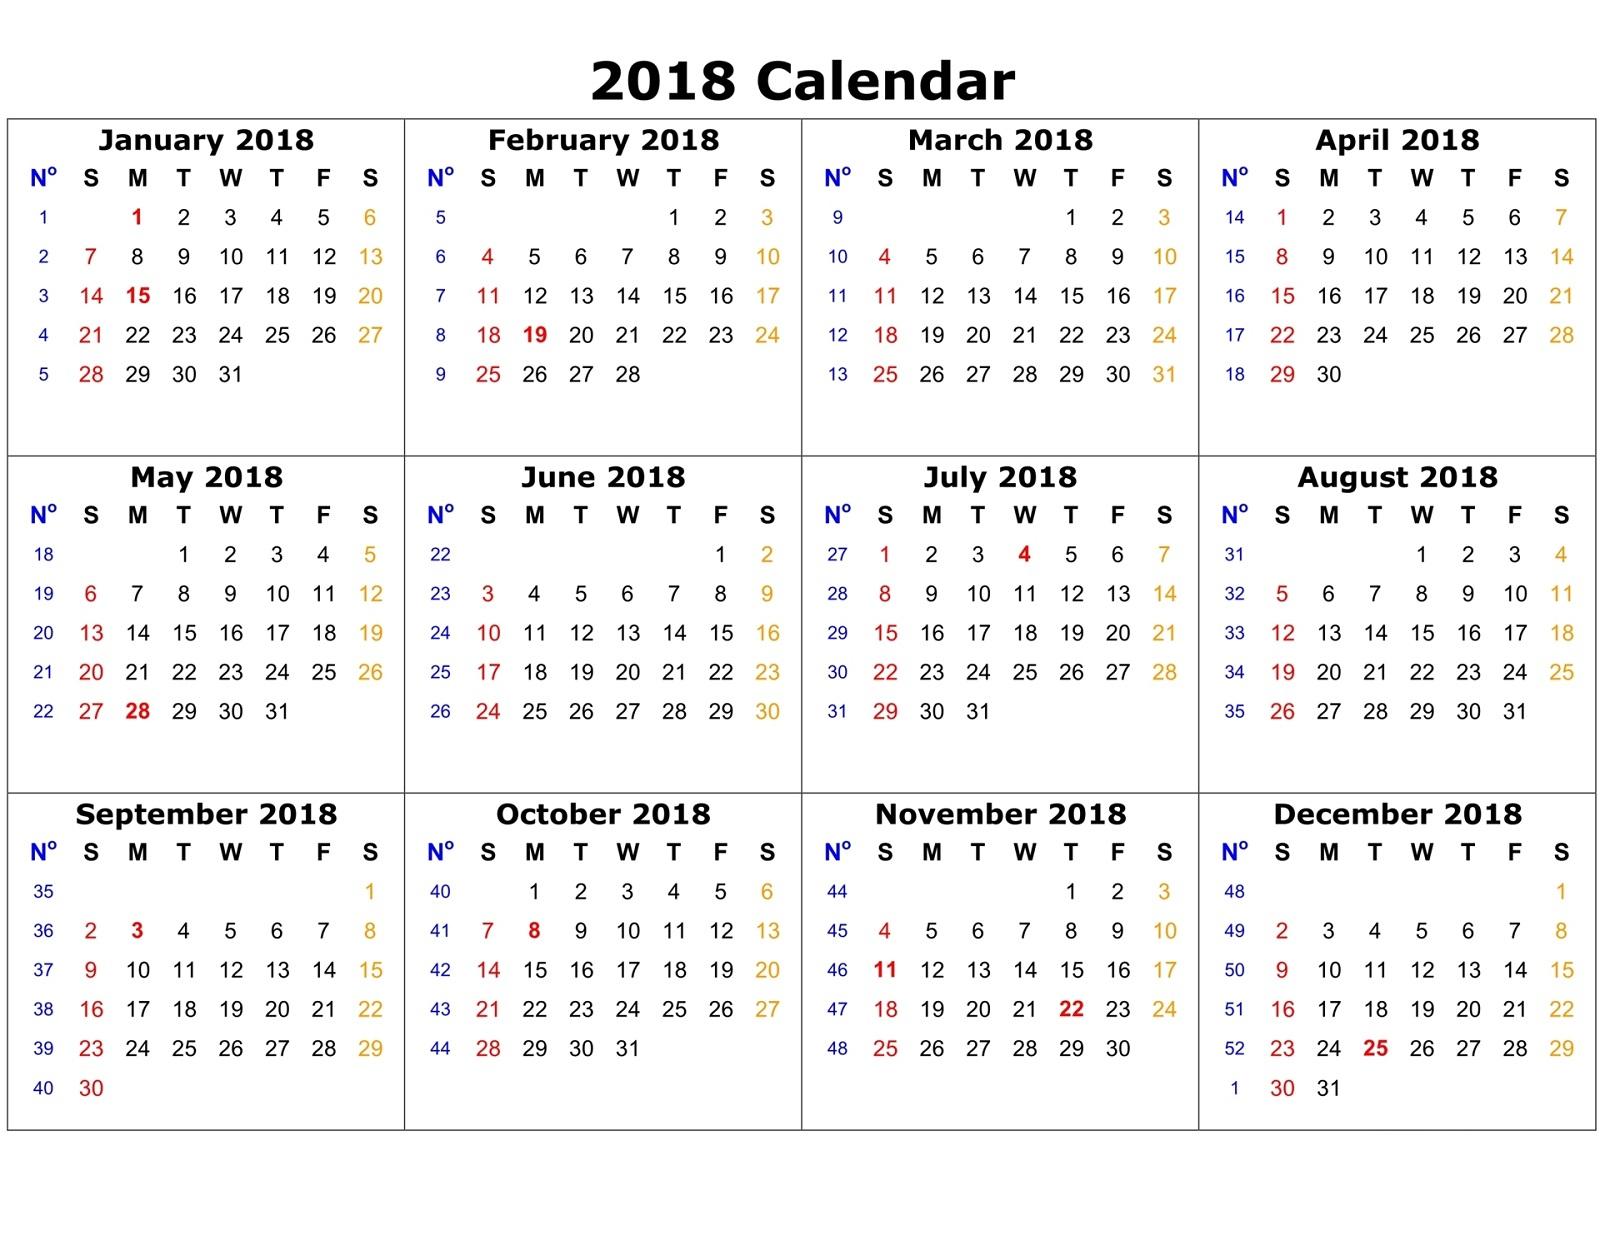 Calendar Template 2018 High Quality | Loving Printable